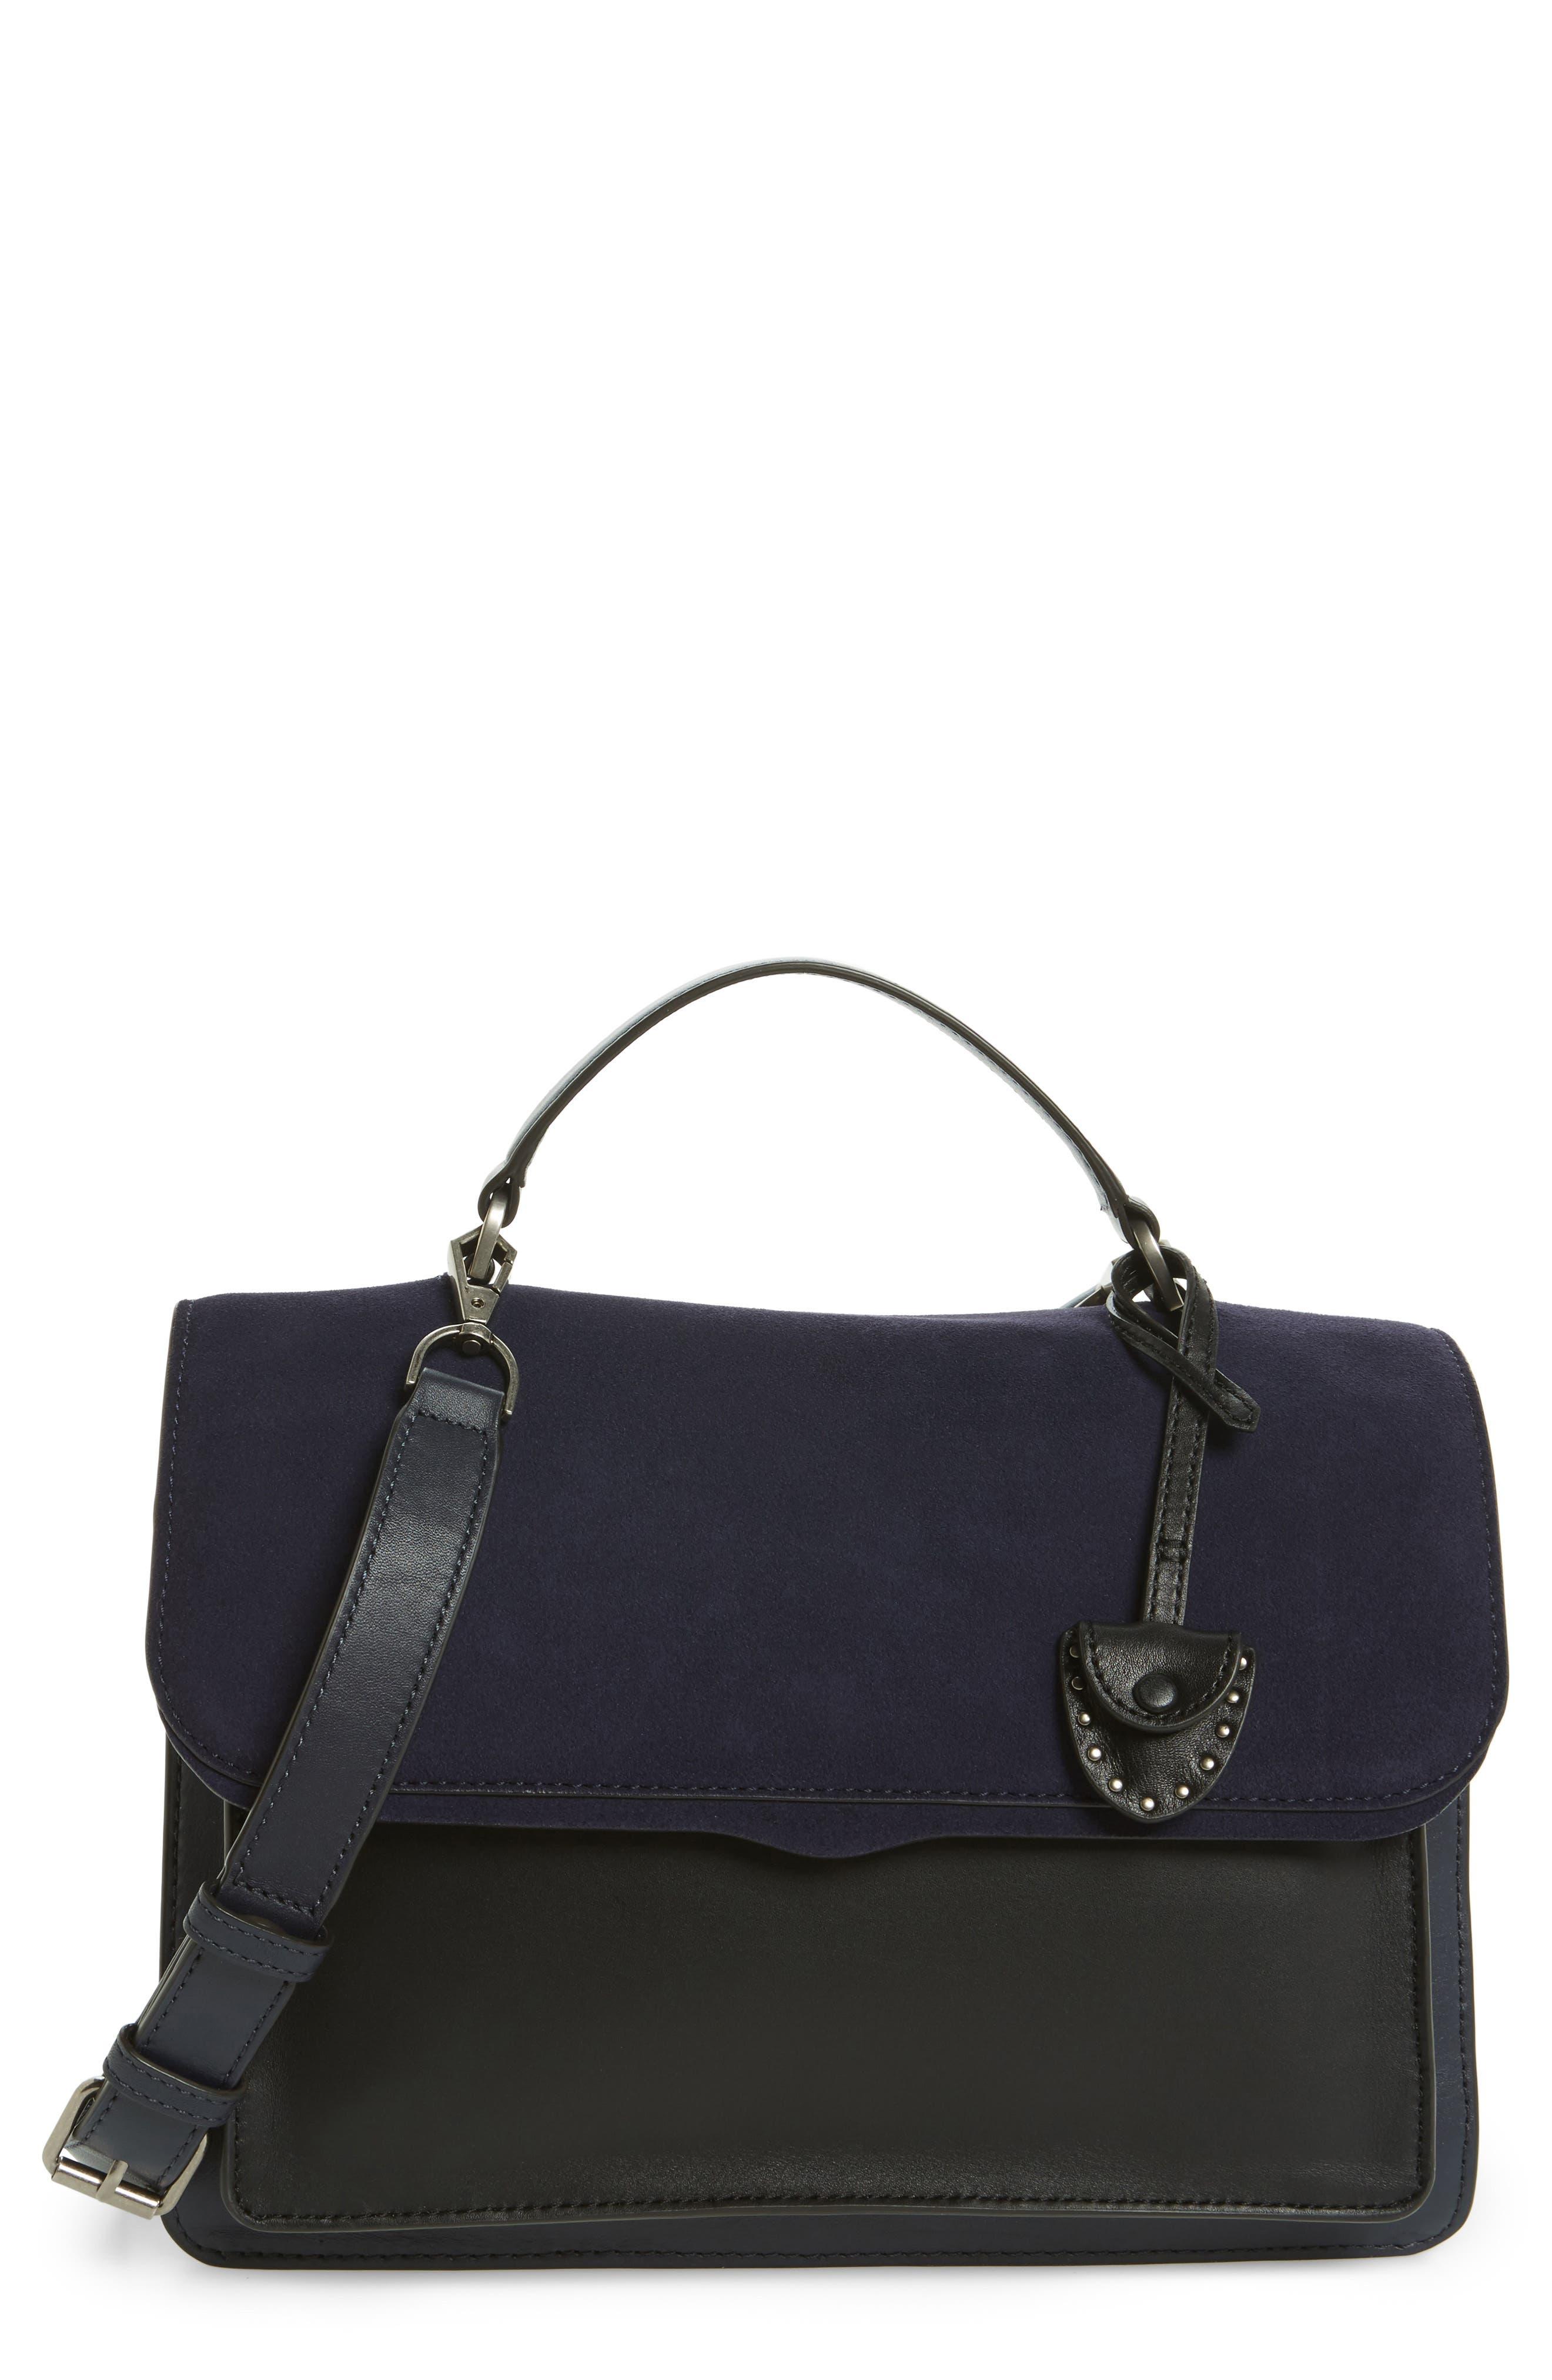 Top Handle Shoulder Bag,                             Main thumbnail 1, color,                             Black